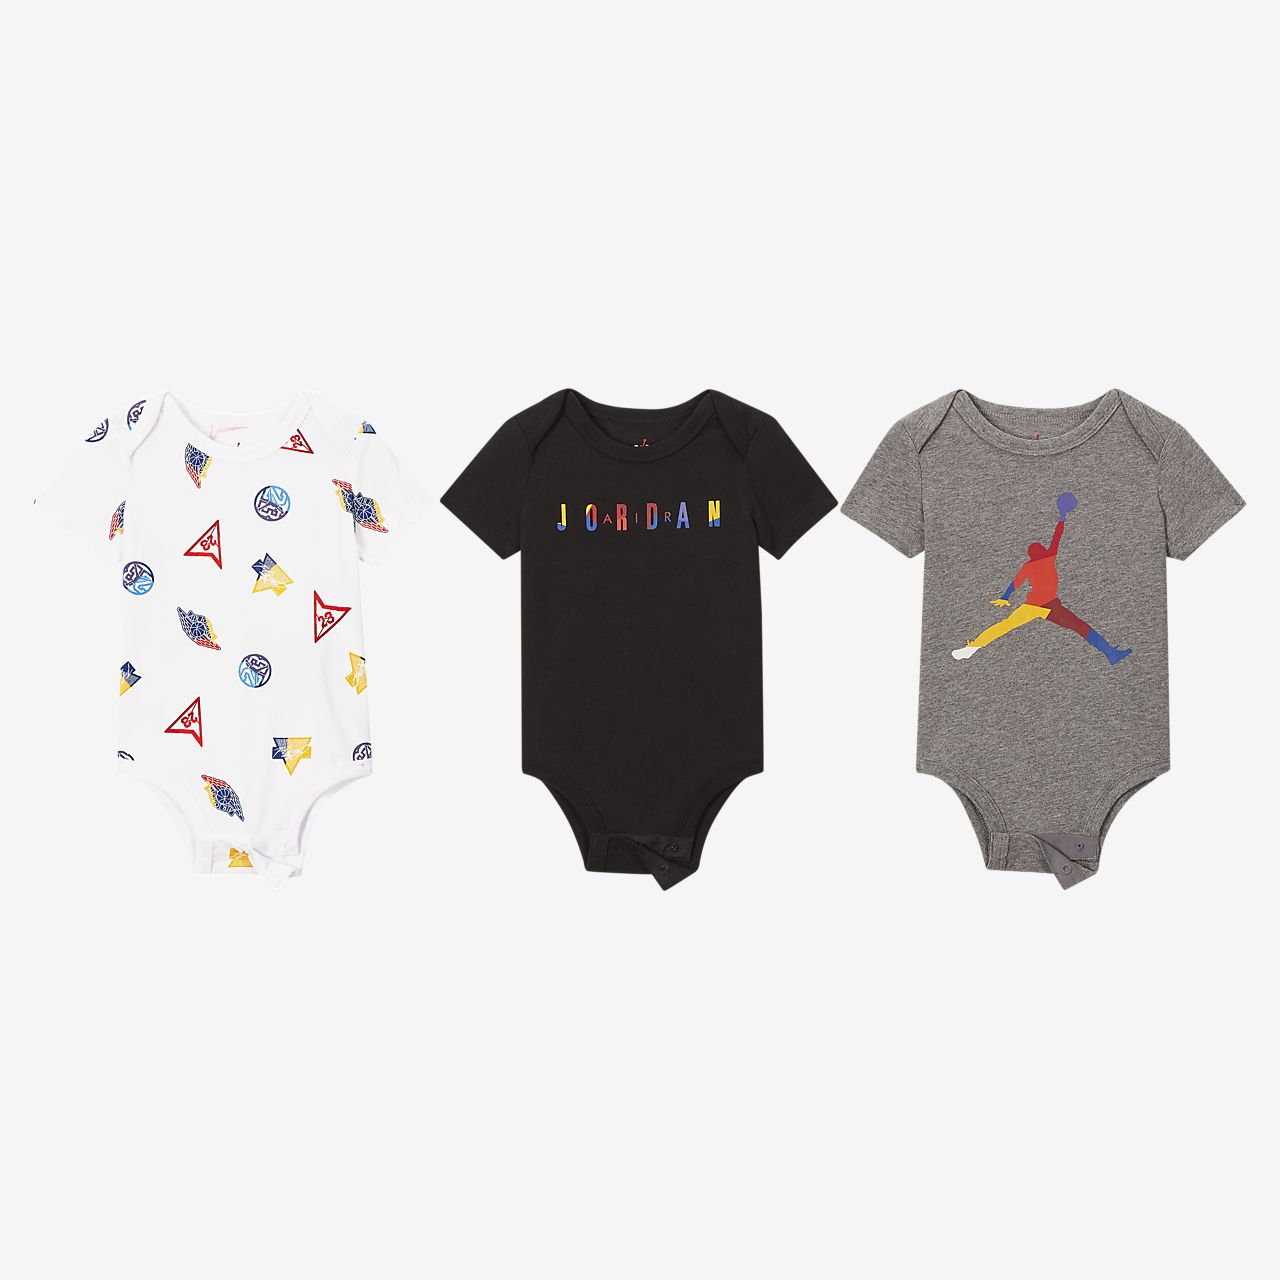 Jordan Baby (0–9M) Short-Sleeve Bodysuit (3-Pack)